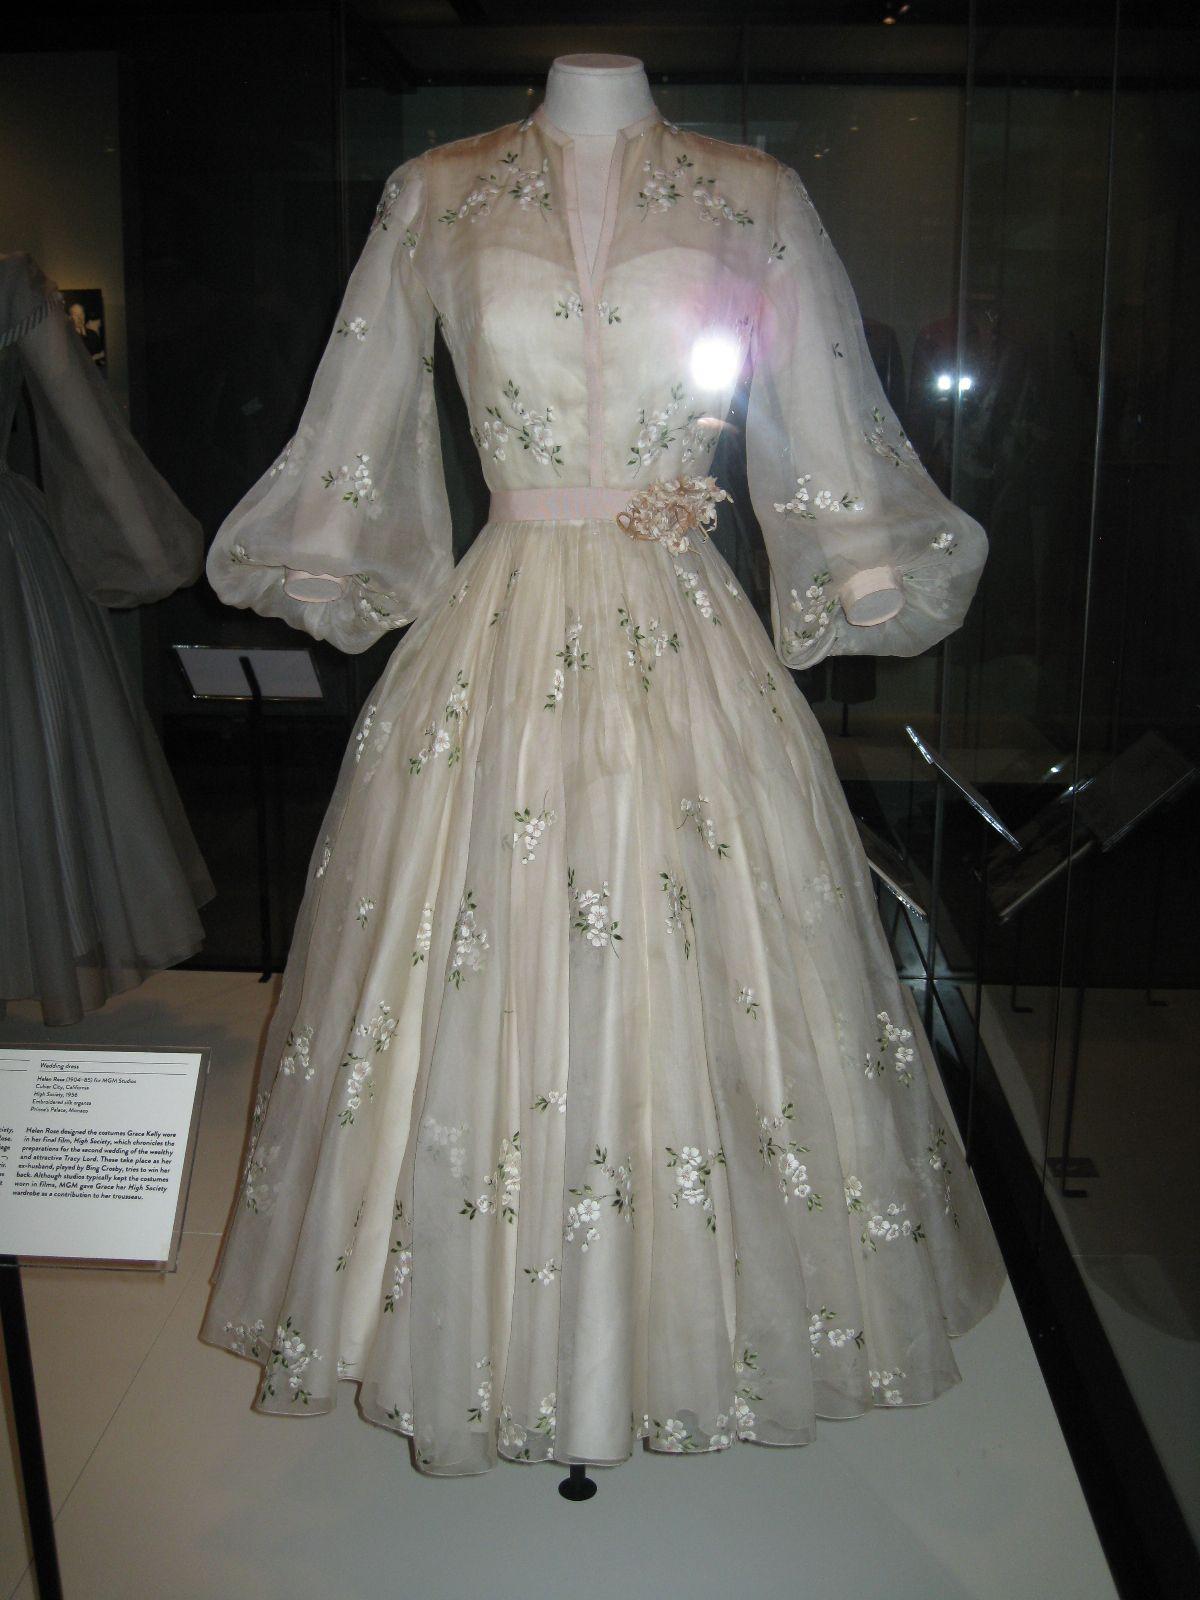 Grace Kelly Wedding Dress Helen Rose For Mgm Studios Film High Society 1956 Mccord Museum 2013 Grace Kelly Dresses Vintage Dresses Helen Rose [ 1600 x 1200 Pixel ]